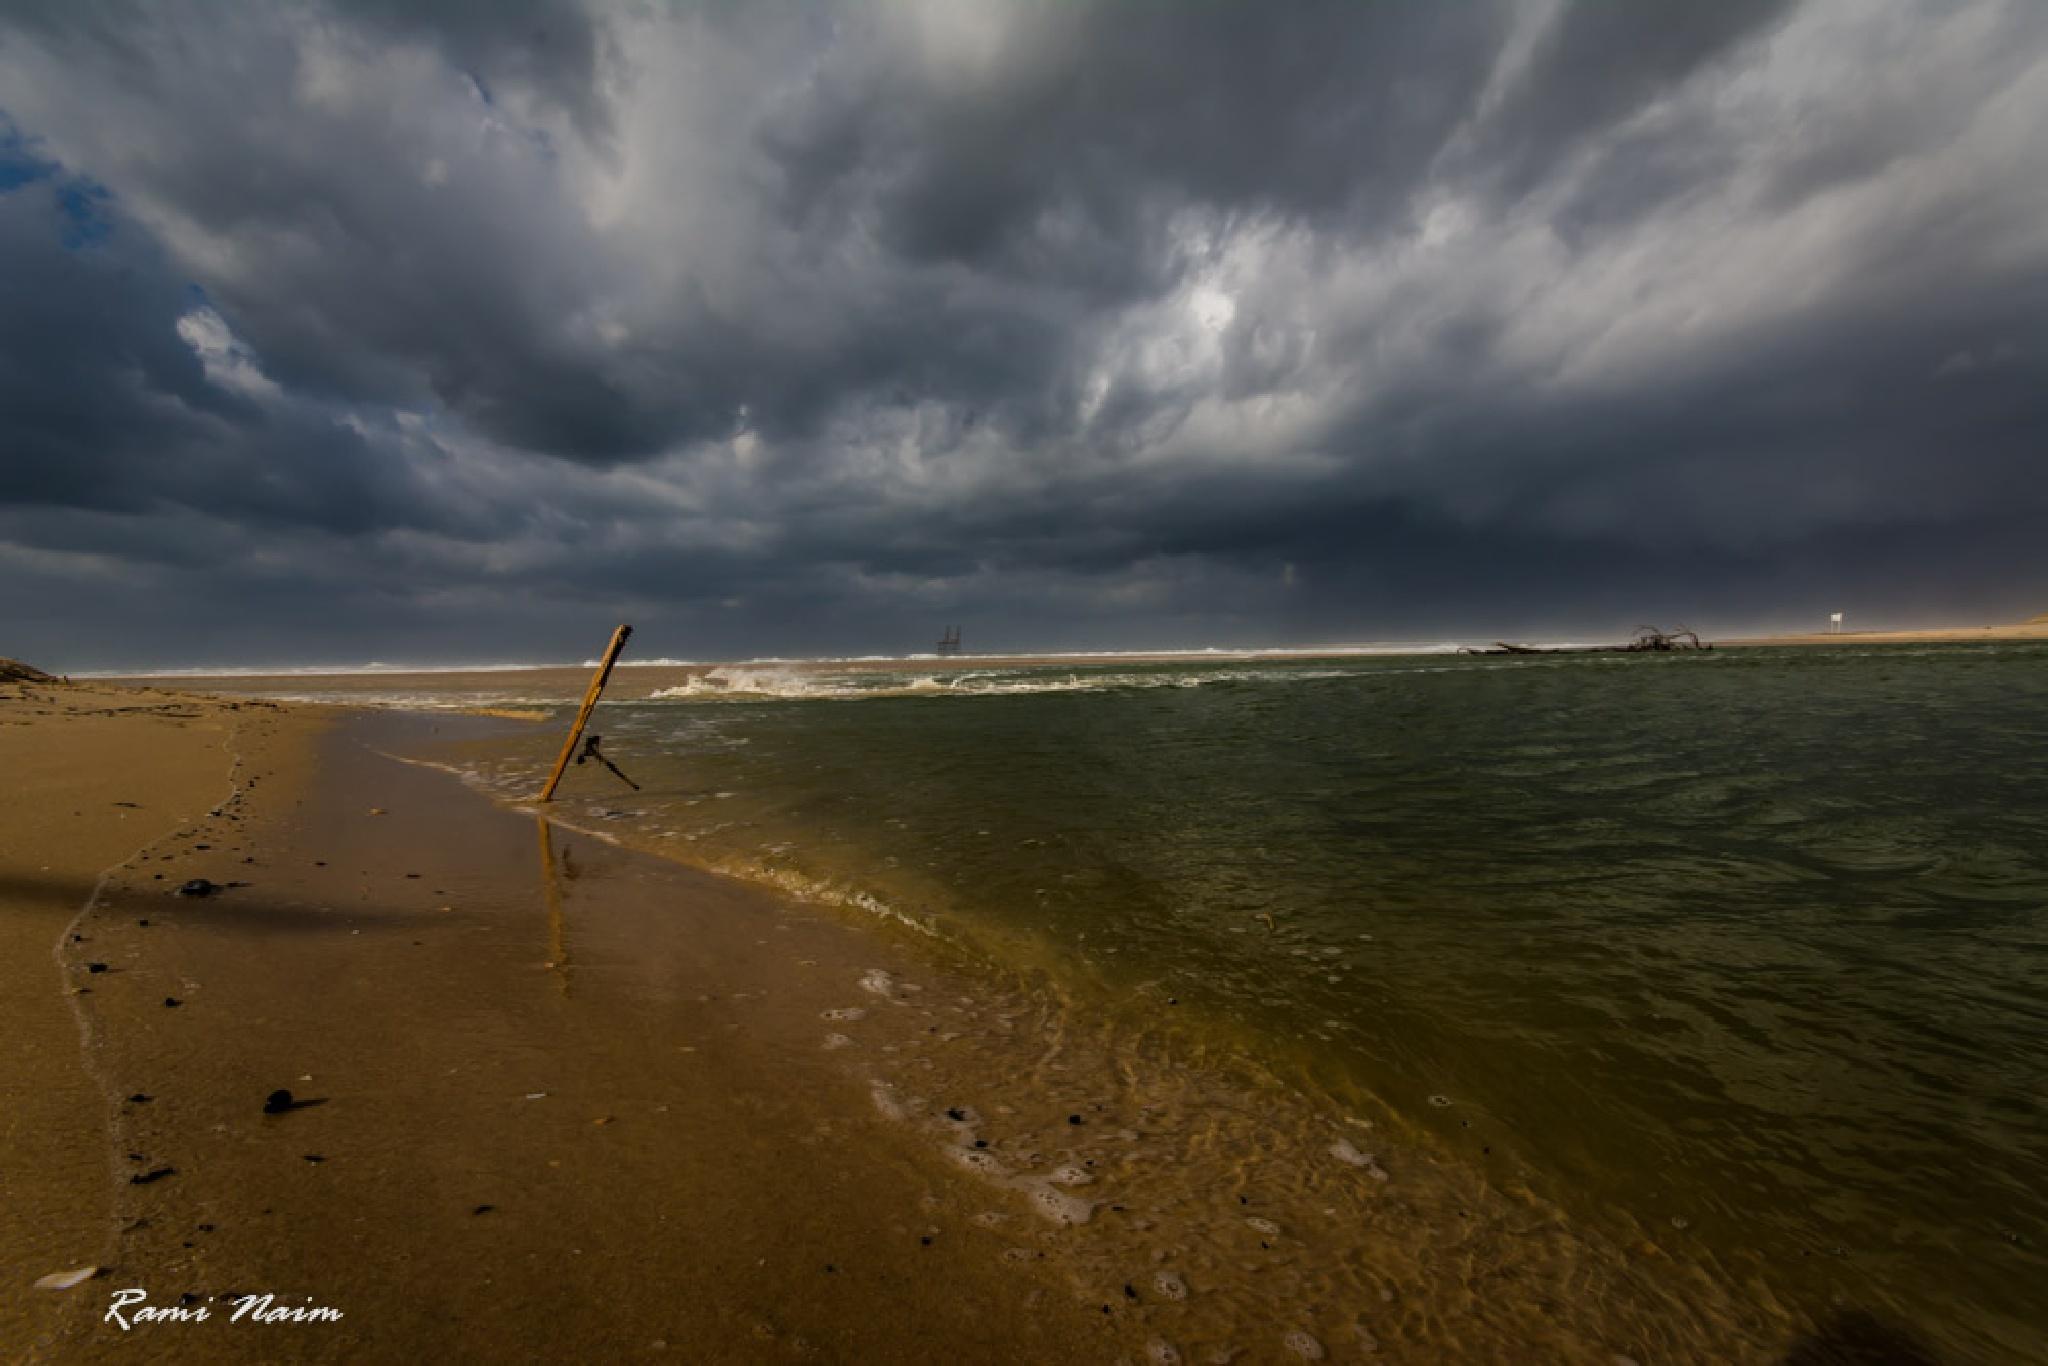 Towards a storm by raminaim